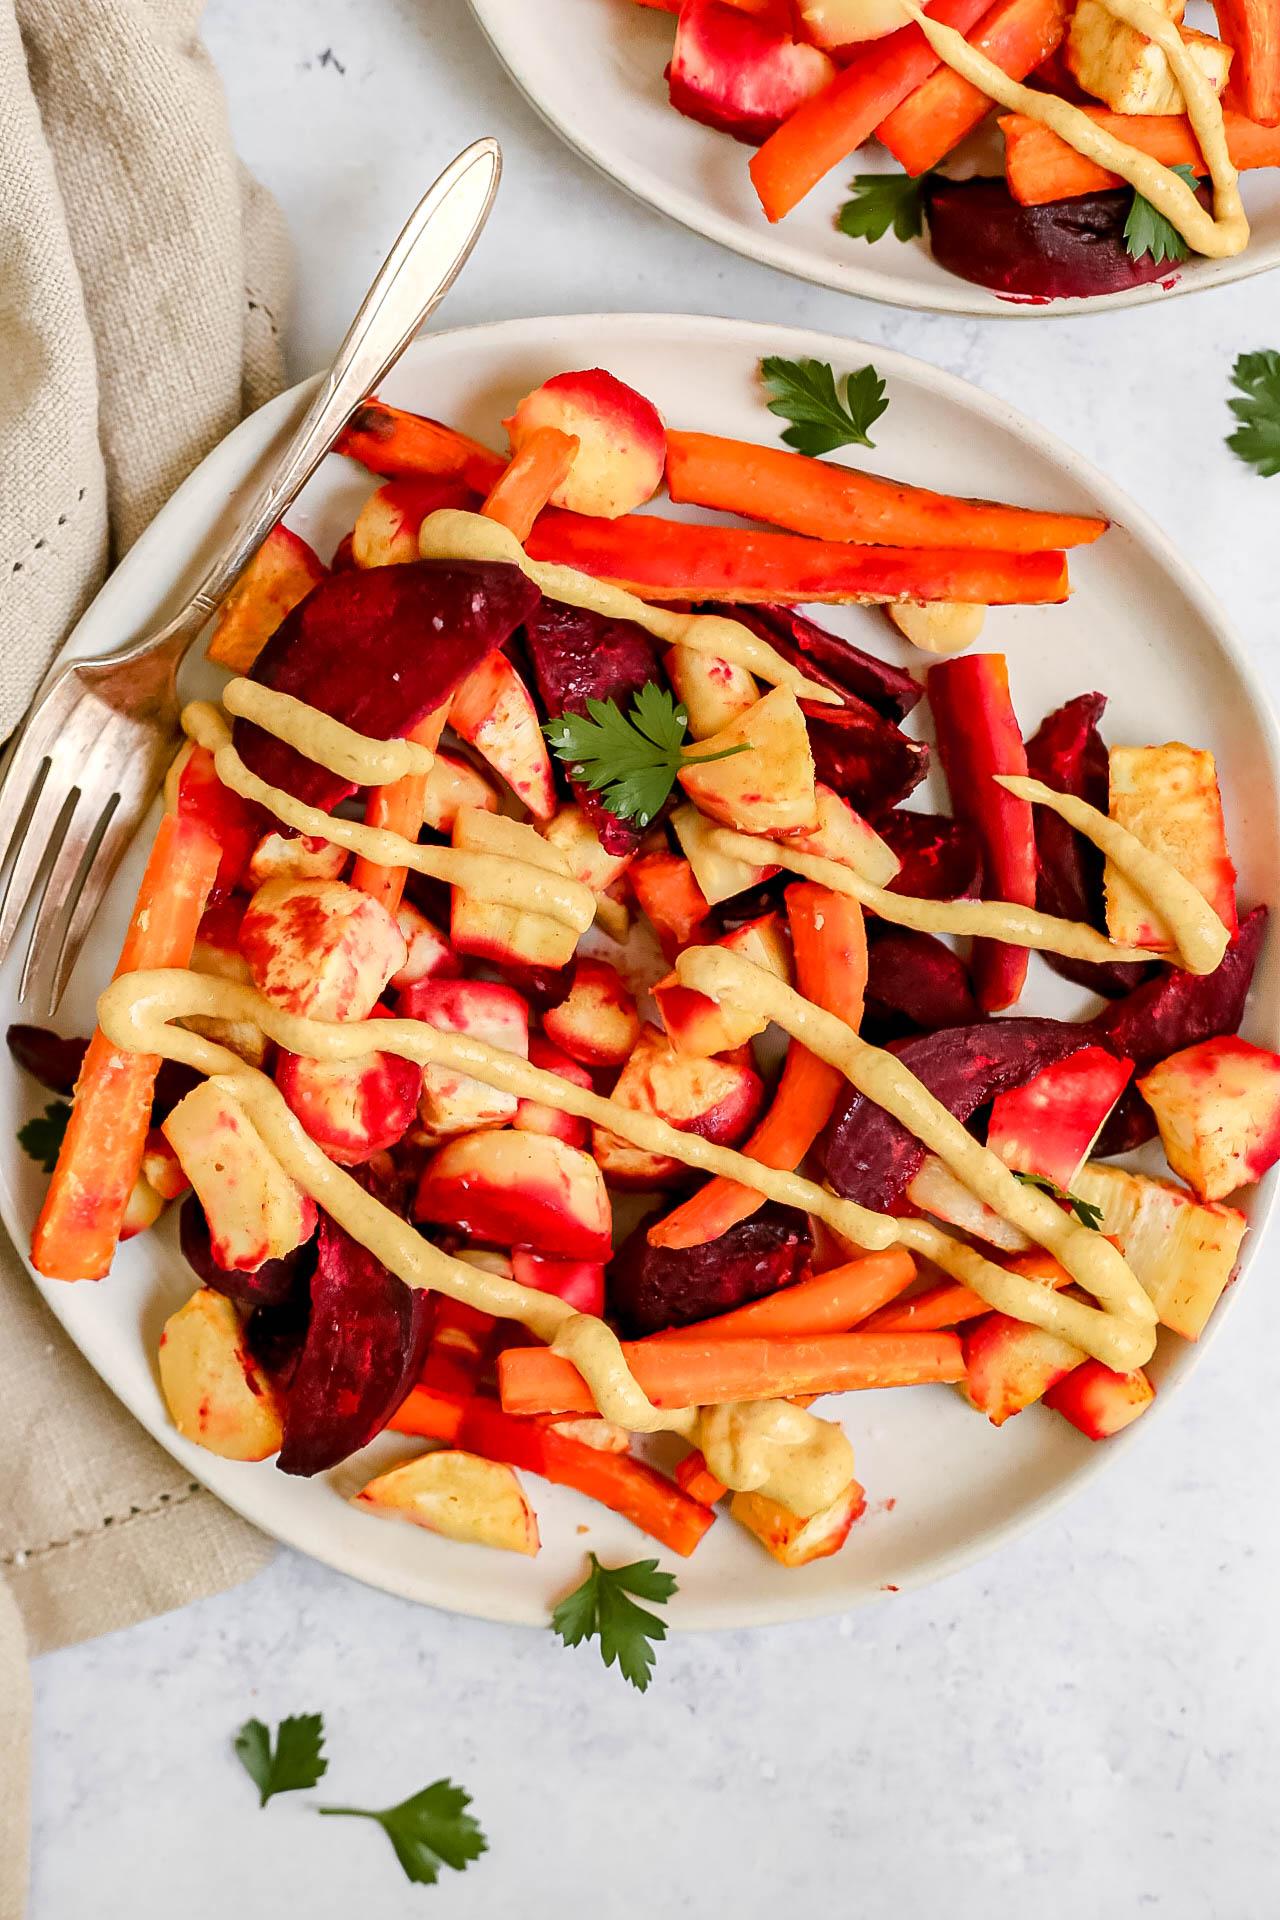 Dijon Roasted Root Vegetables